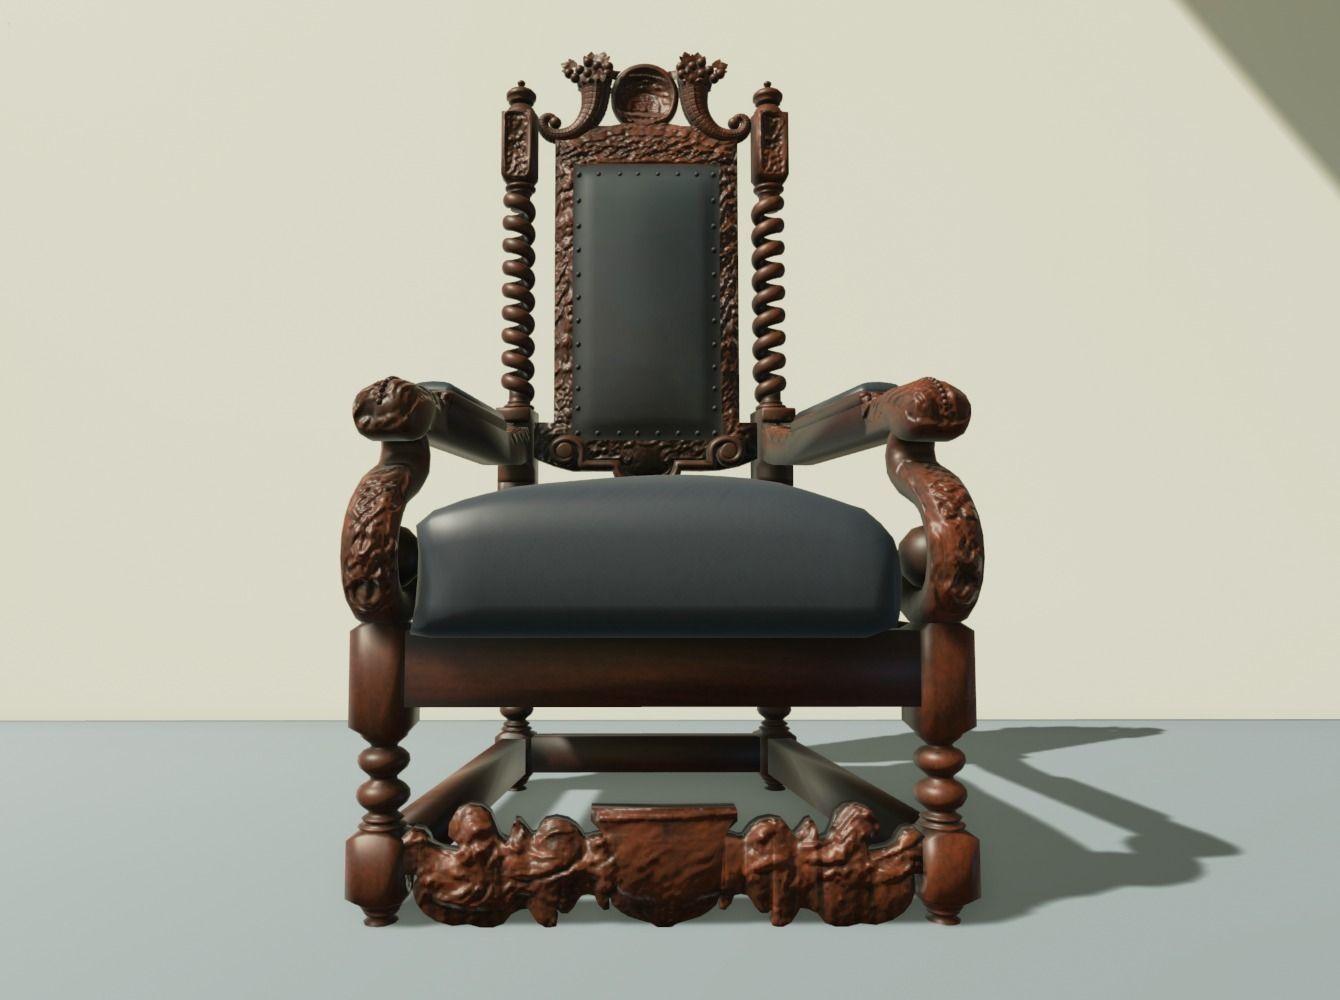 ... antique throne chair 3d model obj mtl 2 ... - 3D Model Antique Throne Chair CGTrader